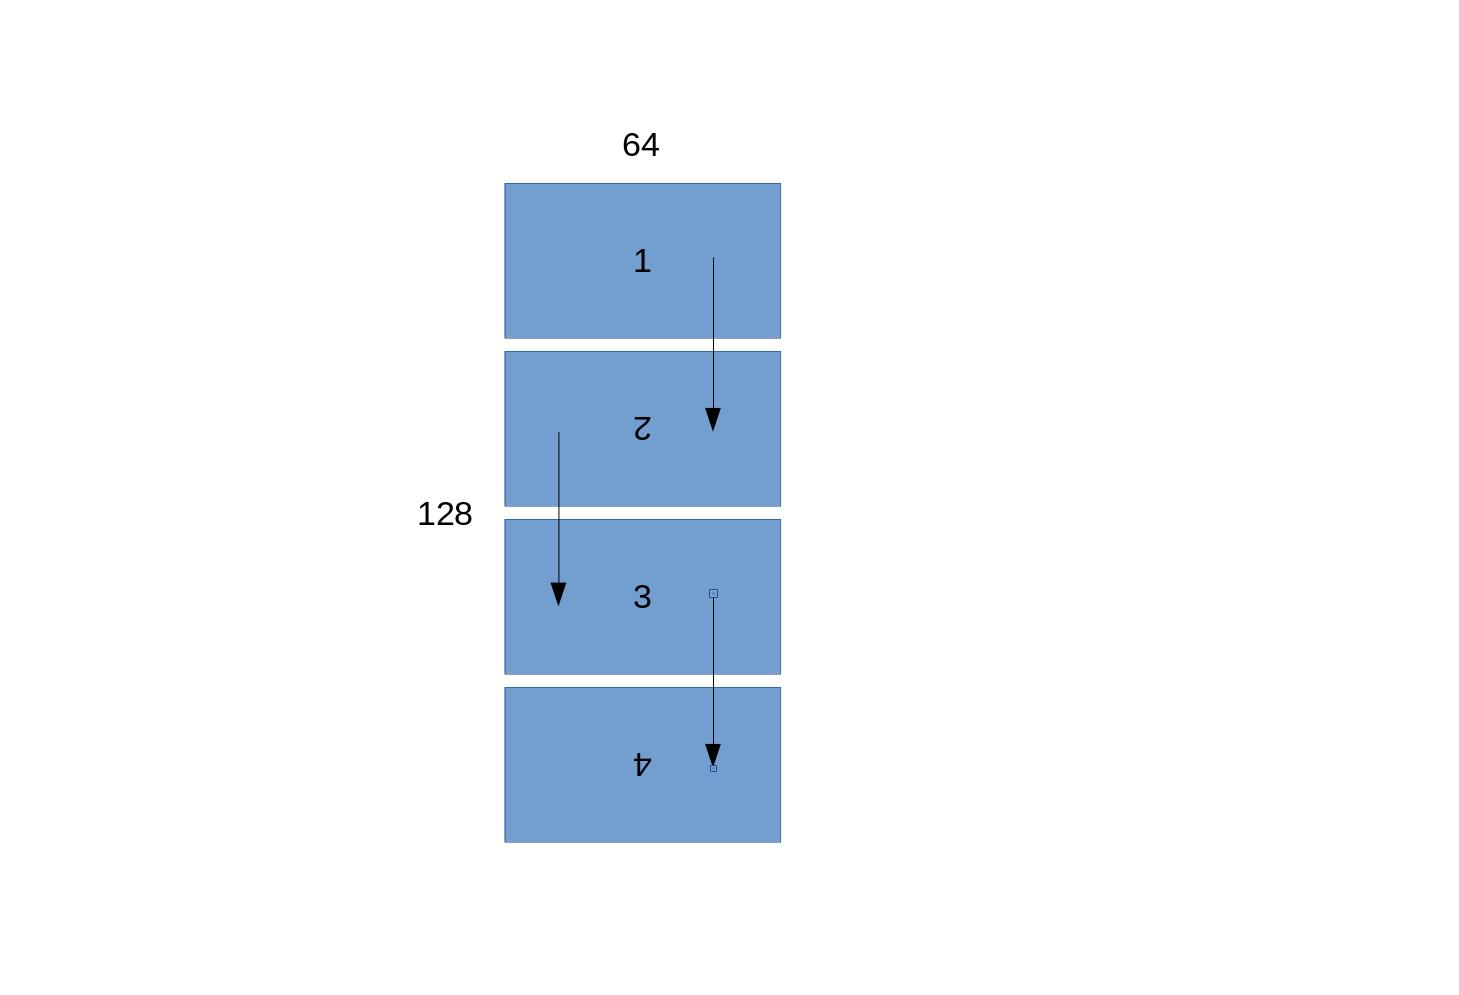 led_matrices_ksnip_20210128-112054.png